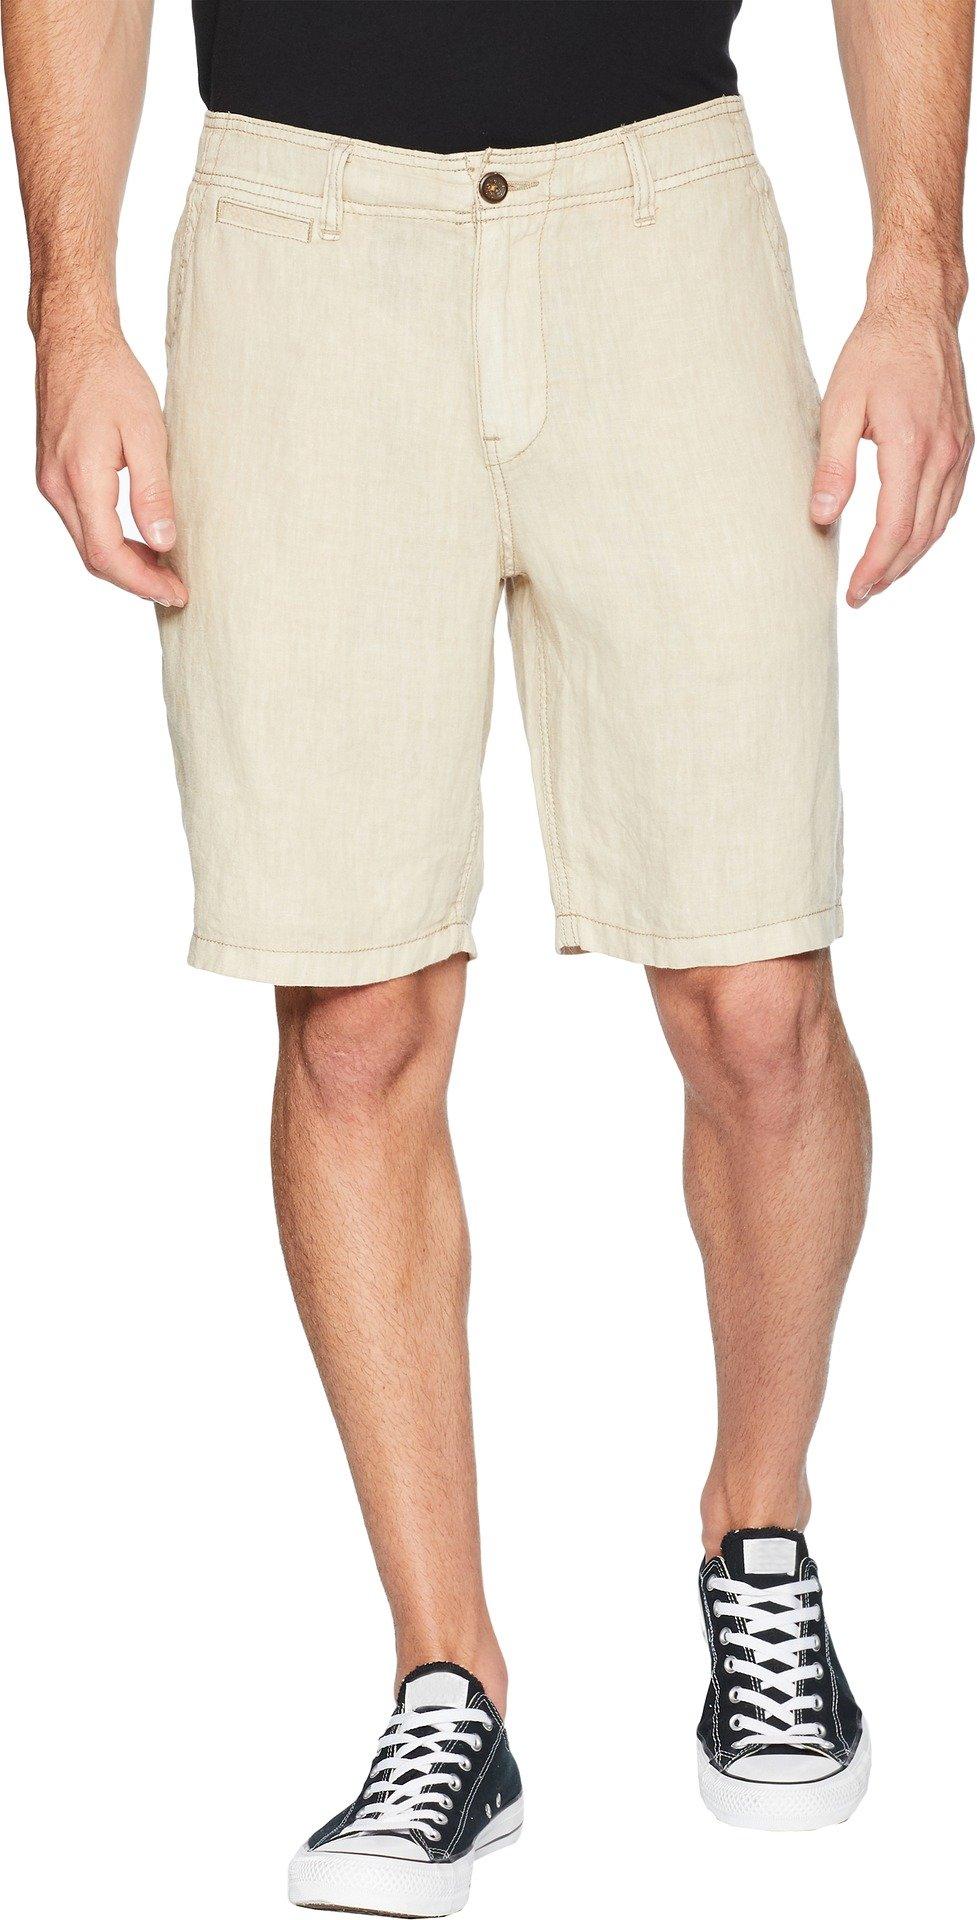 Lucky Brand Men's Laguna Linen Flat Front Short, Plaza Taupe, 32